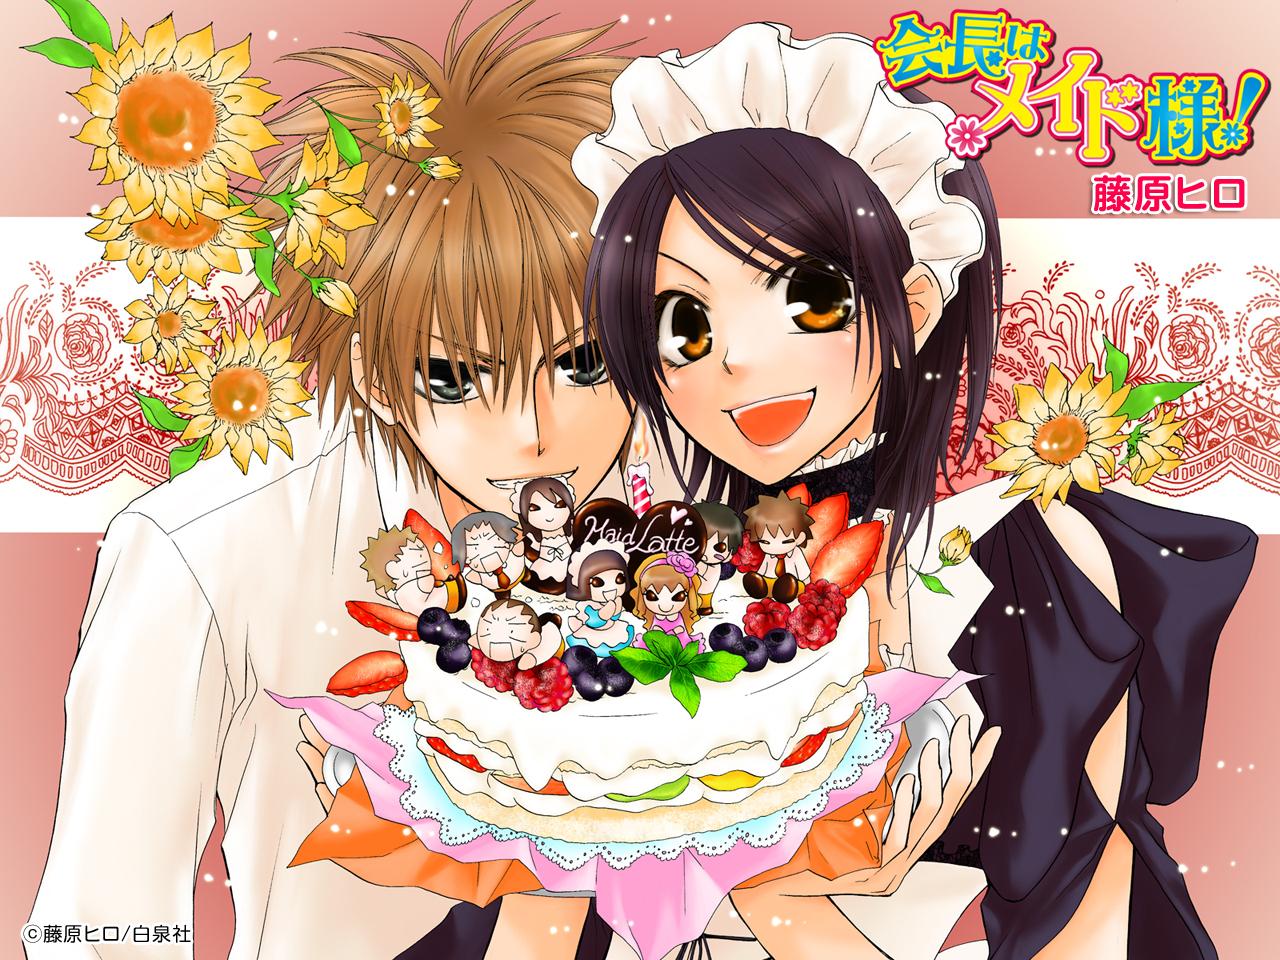 Anime: Kaichou Wa Maid-sama